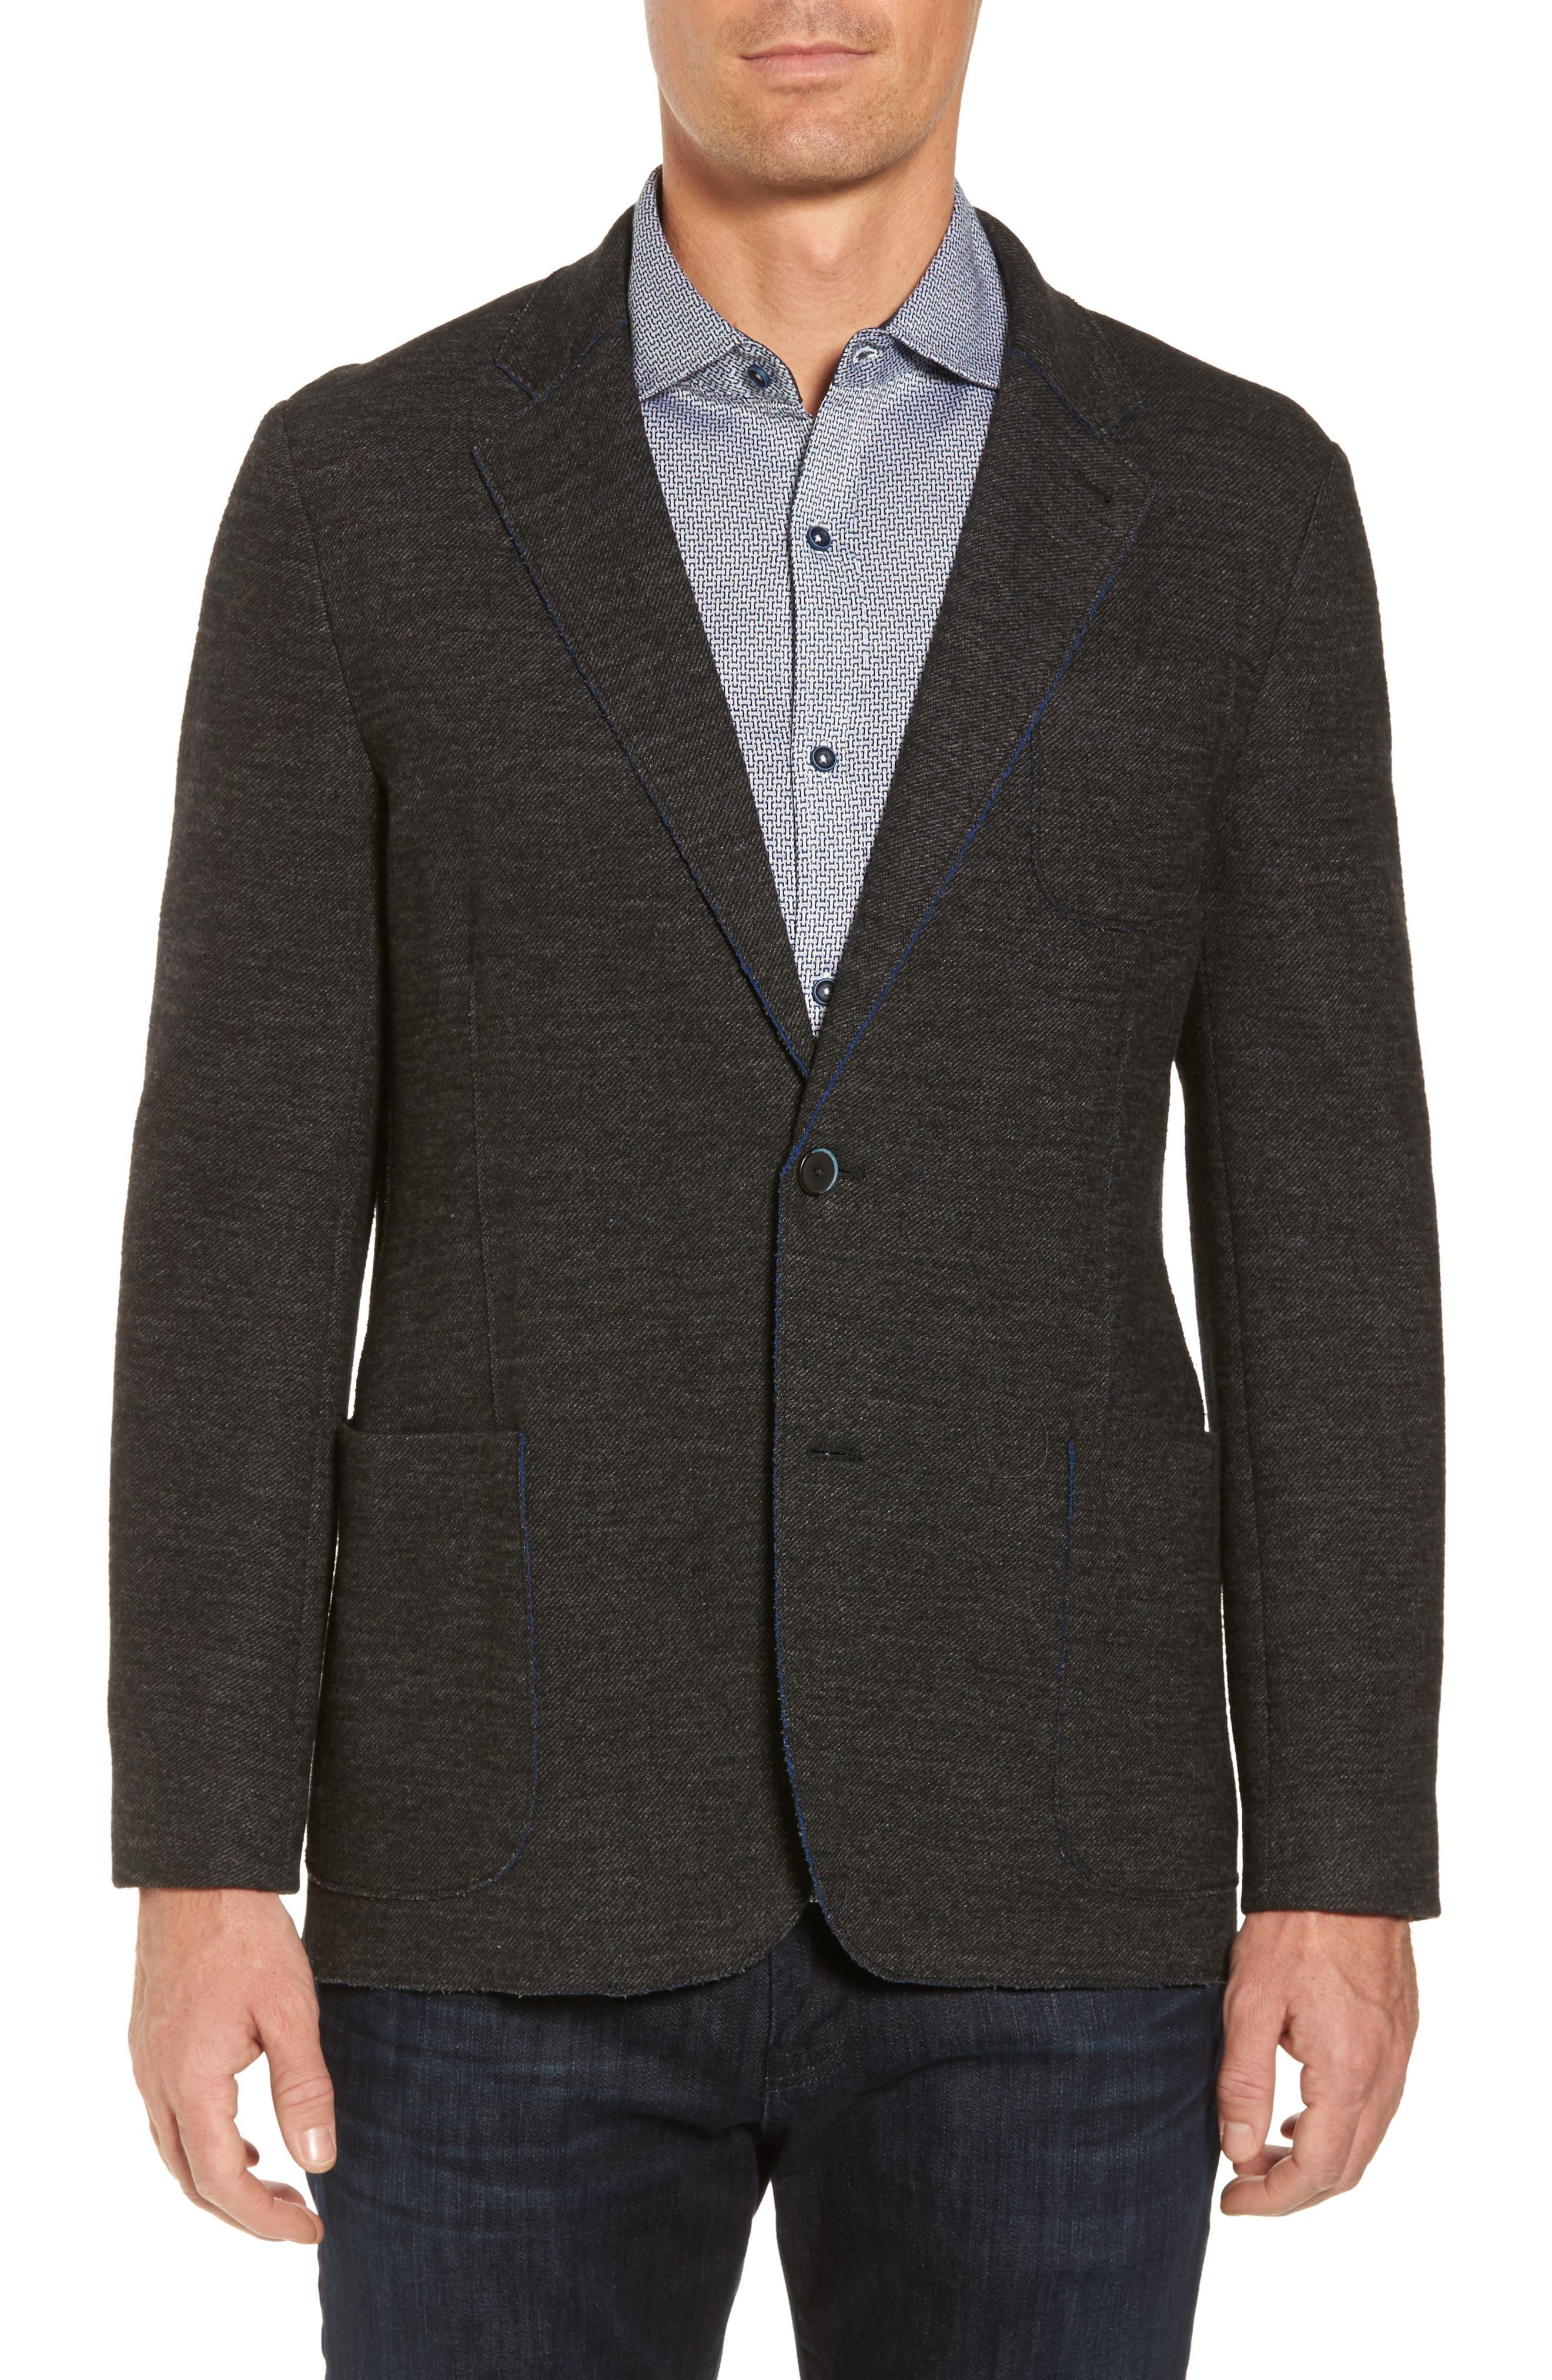 Main Image - Bugatchi Raw Edge Cotton Blend Blazer